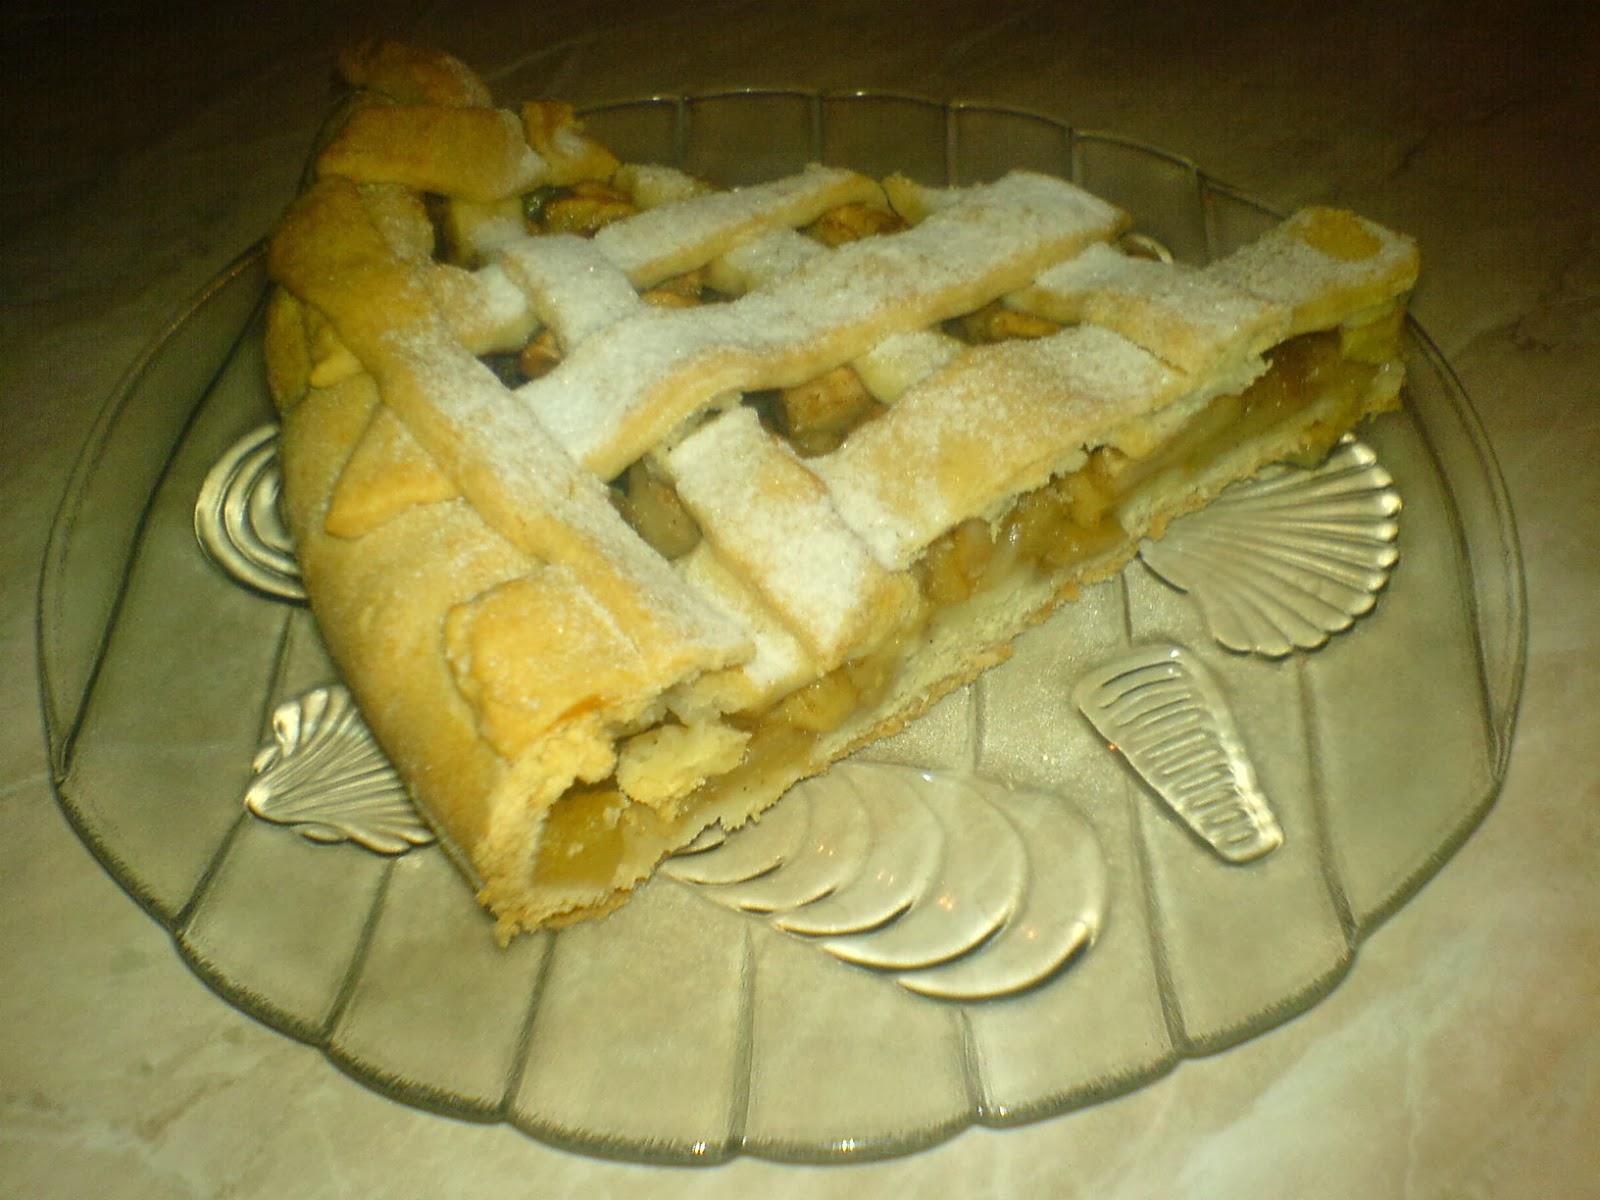 prajituri, dulciuri, placinta de mere, retete culinare, preparate cu fructe, retete cu fructe, retete culinare cu mere, preparate culinare cu mere